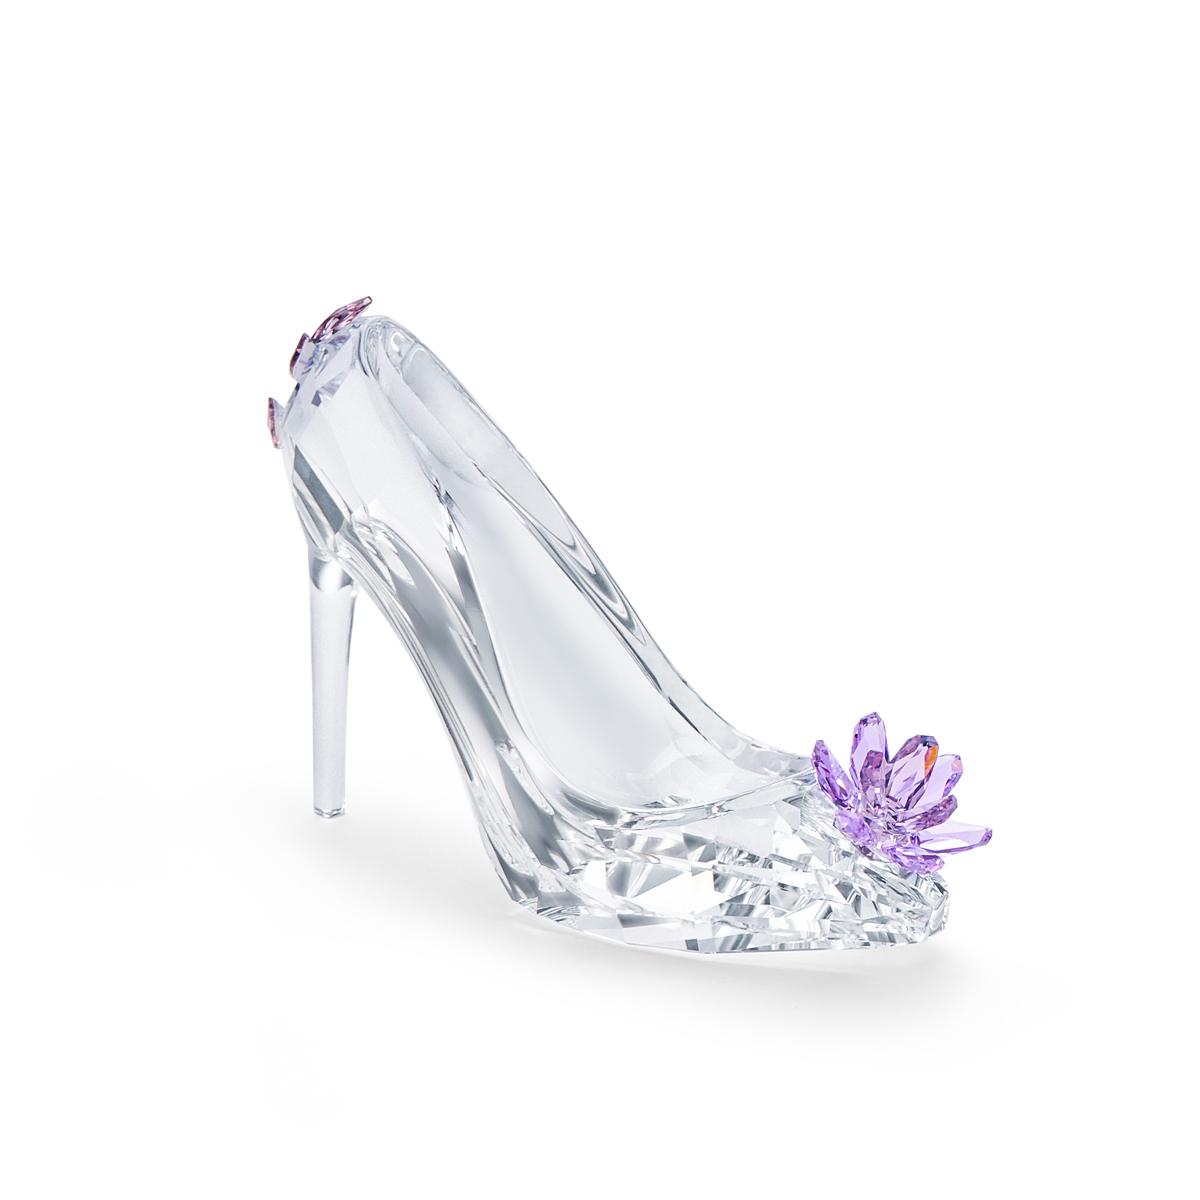 Swarovski Crystal Treasures Shoe With Flower